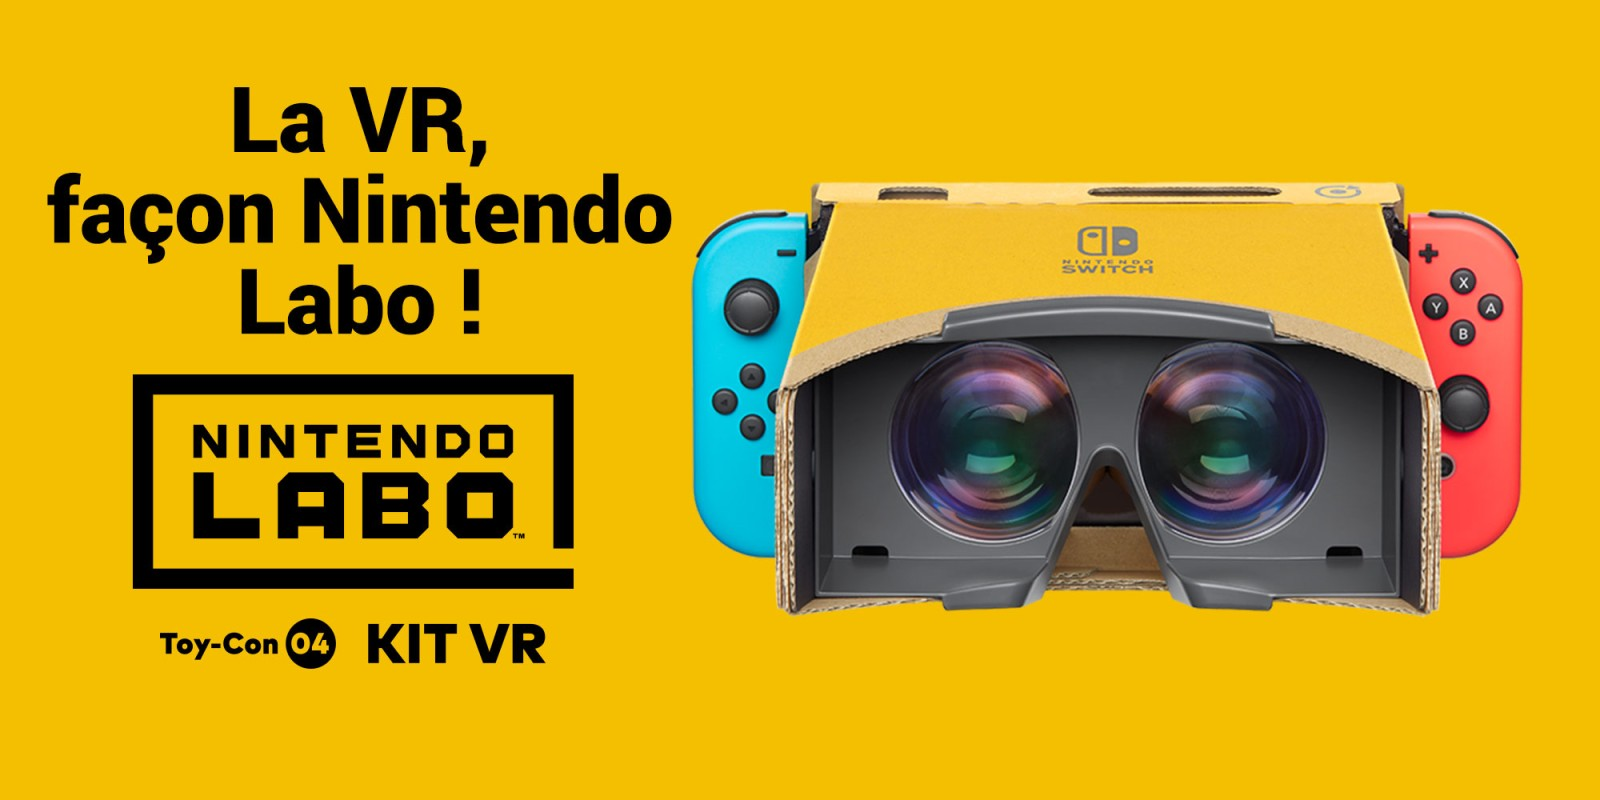 Nintendo Labo Toy-Con 04 : kit VR : simple, convivial et fun